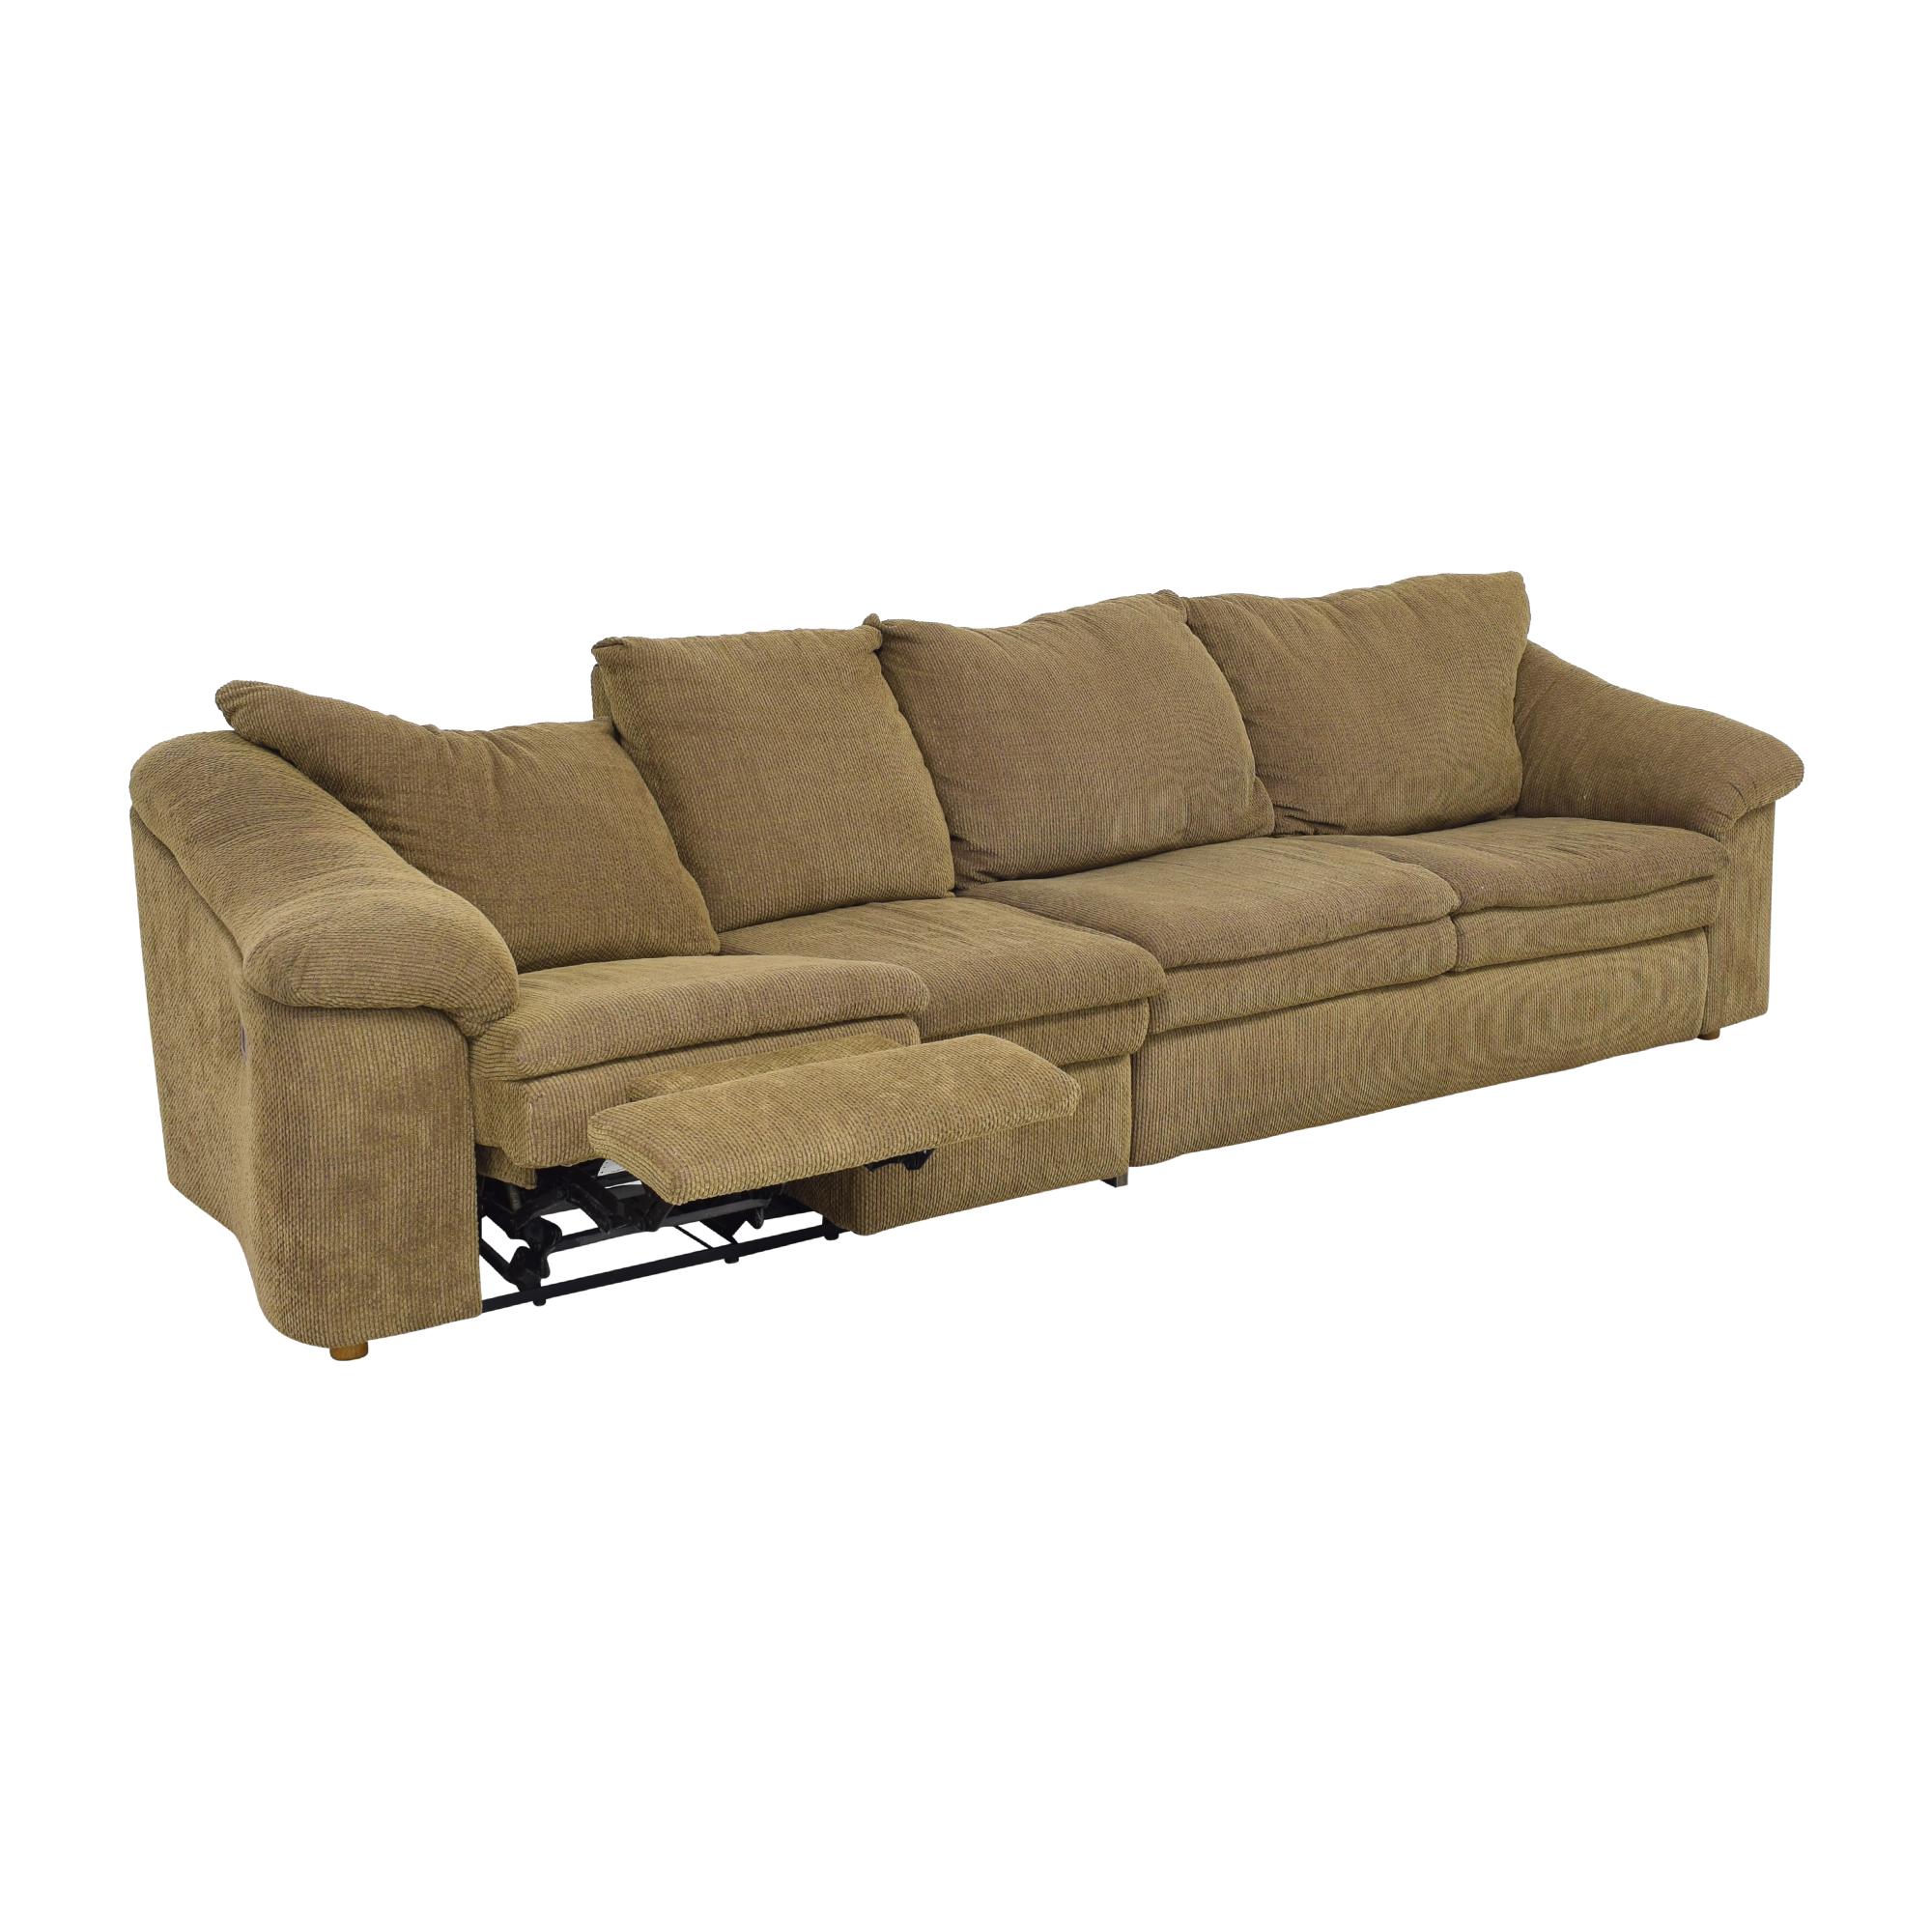 Raymour & Flanigan Sleeper Sofa with Ottoman / Sofas